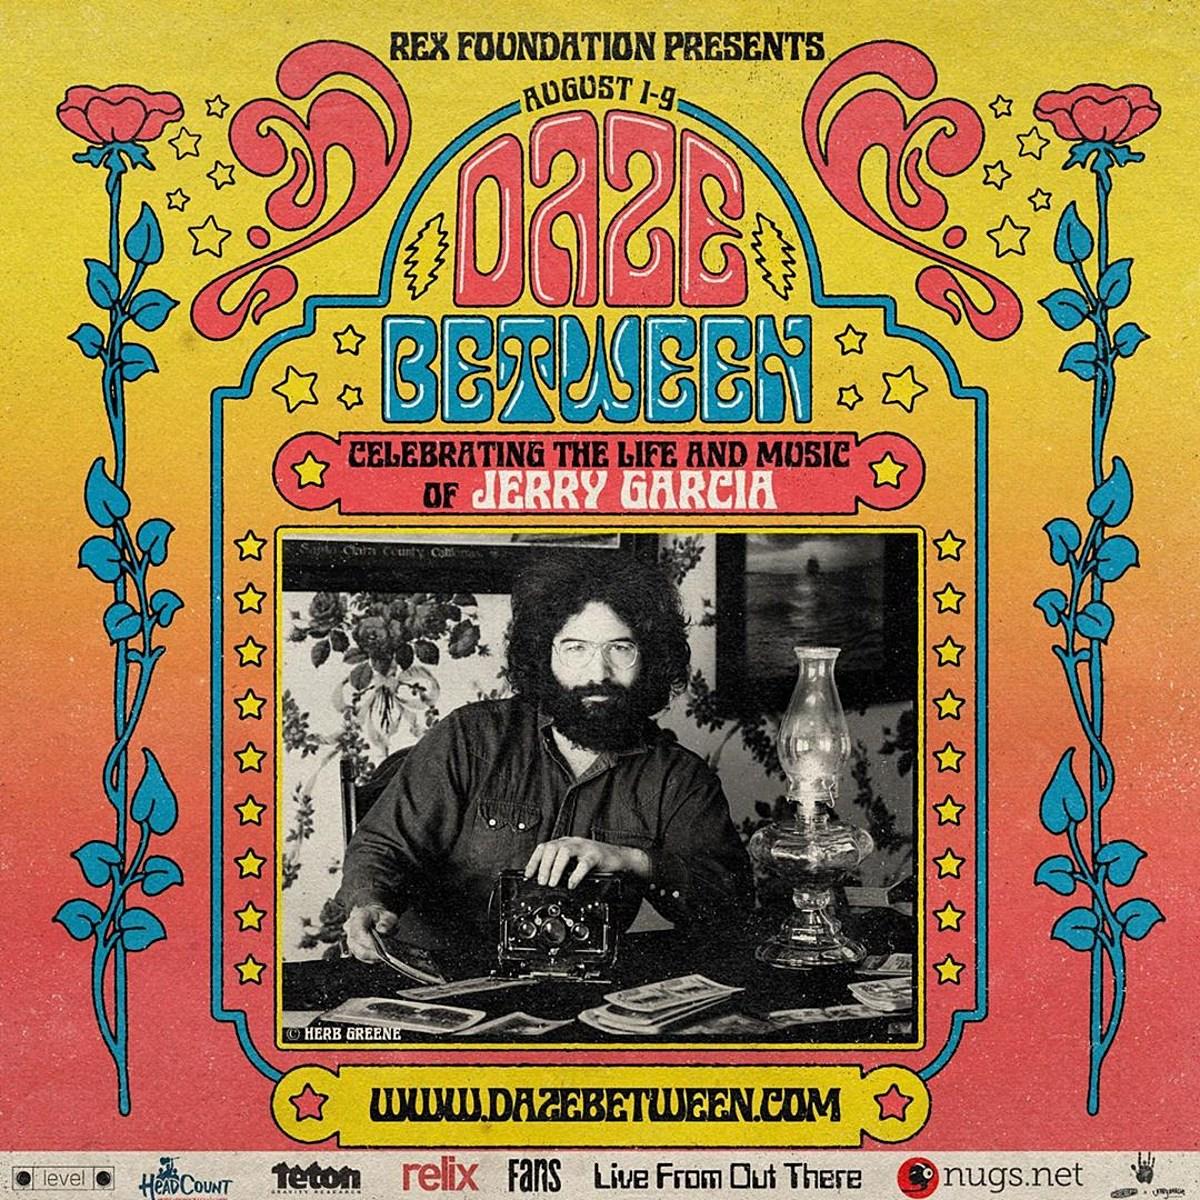 Nine-day Jerry Garcia celebration livestream happening in August w/ live performances, storytelling, more